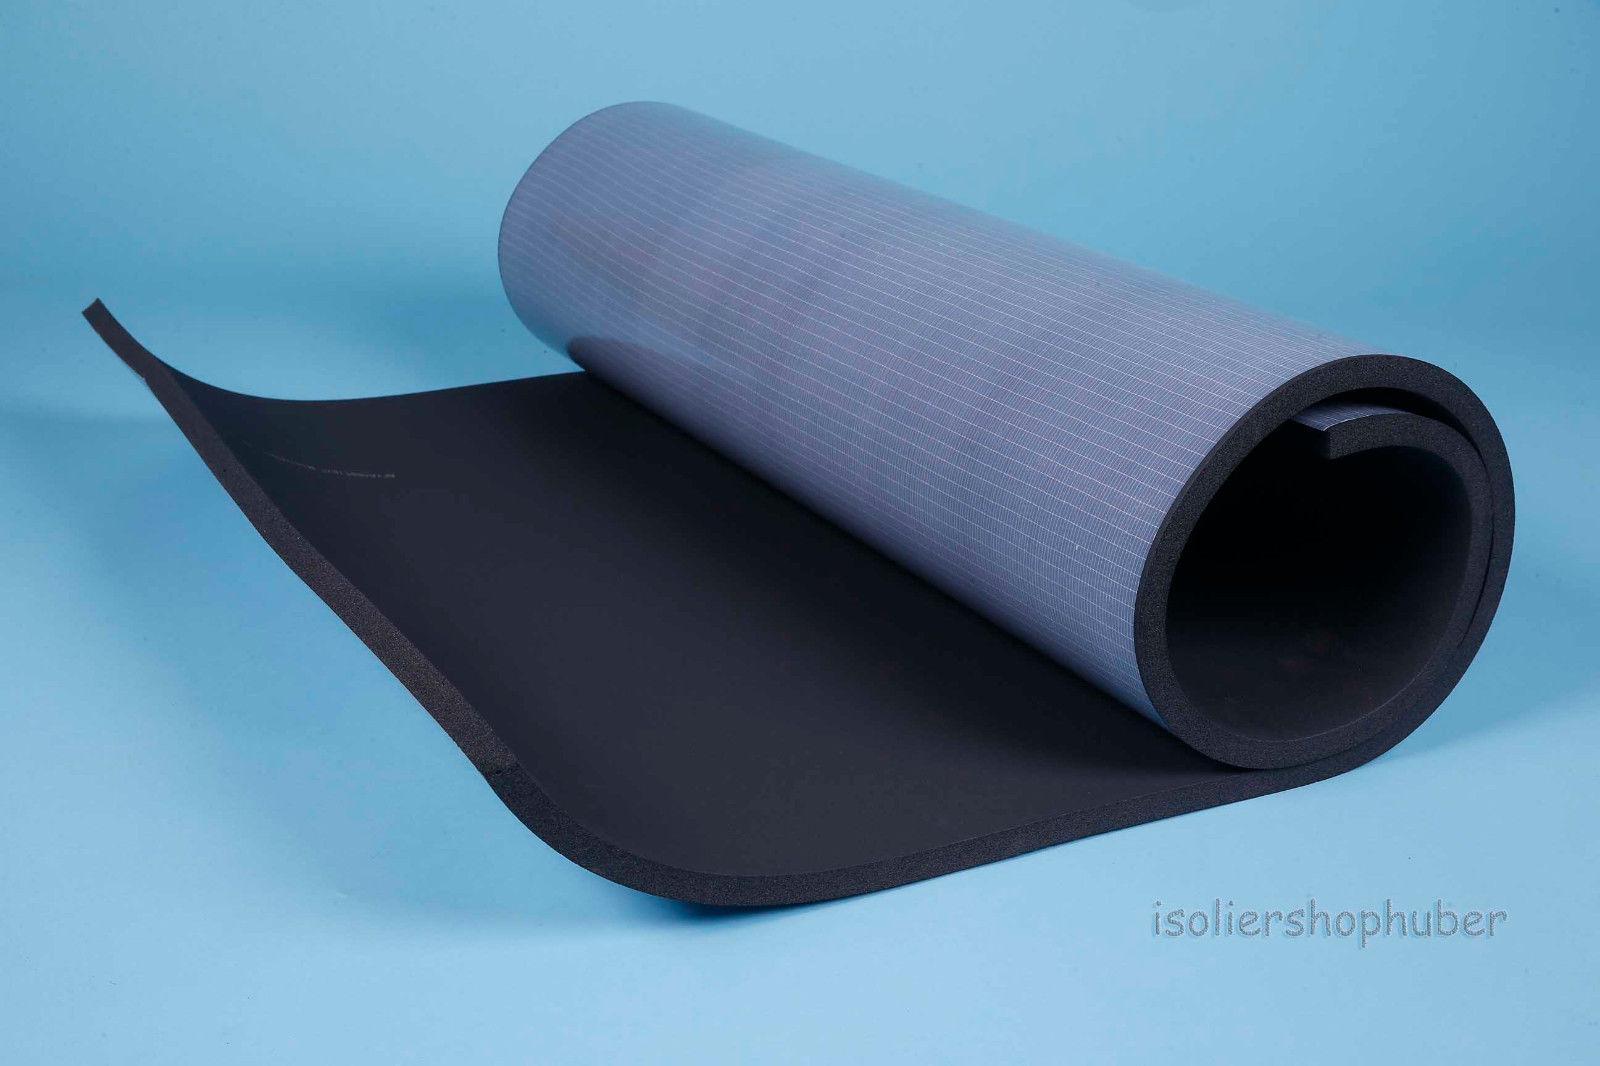 isoliershophuber 1 0 m 25 mm armaflex af ea selbstklebende isolierung kautschuk d mmung. Black Bedroom Furniture Sets. Home Design Ideas